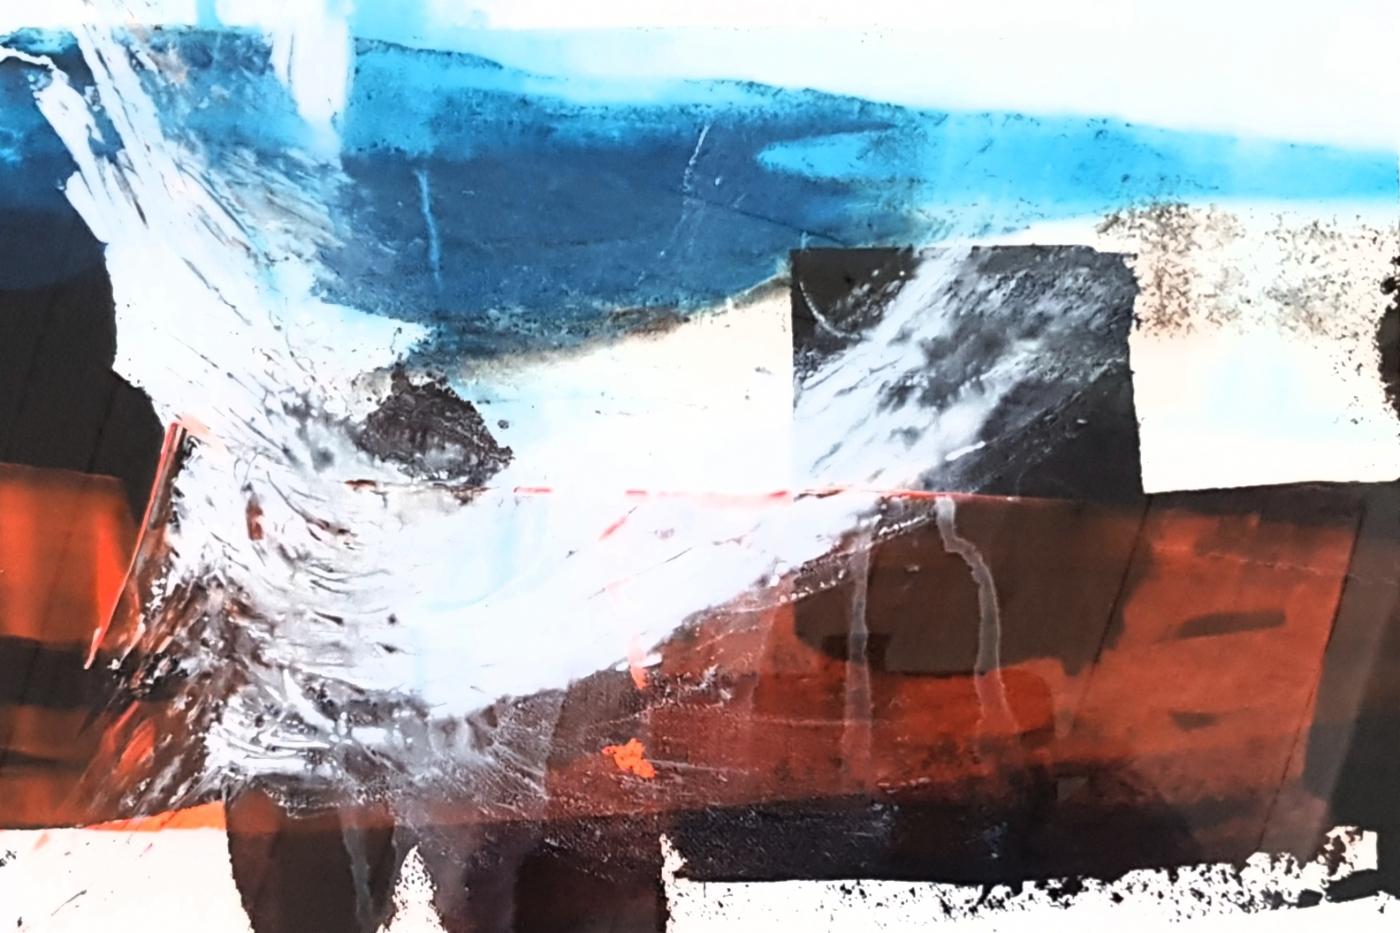 Landskabs abstraktioner  | Maleri